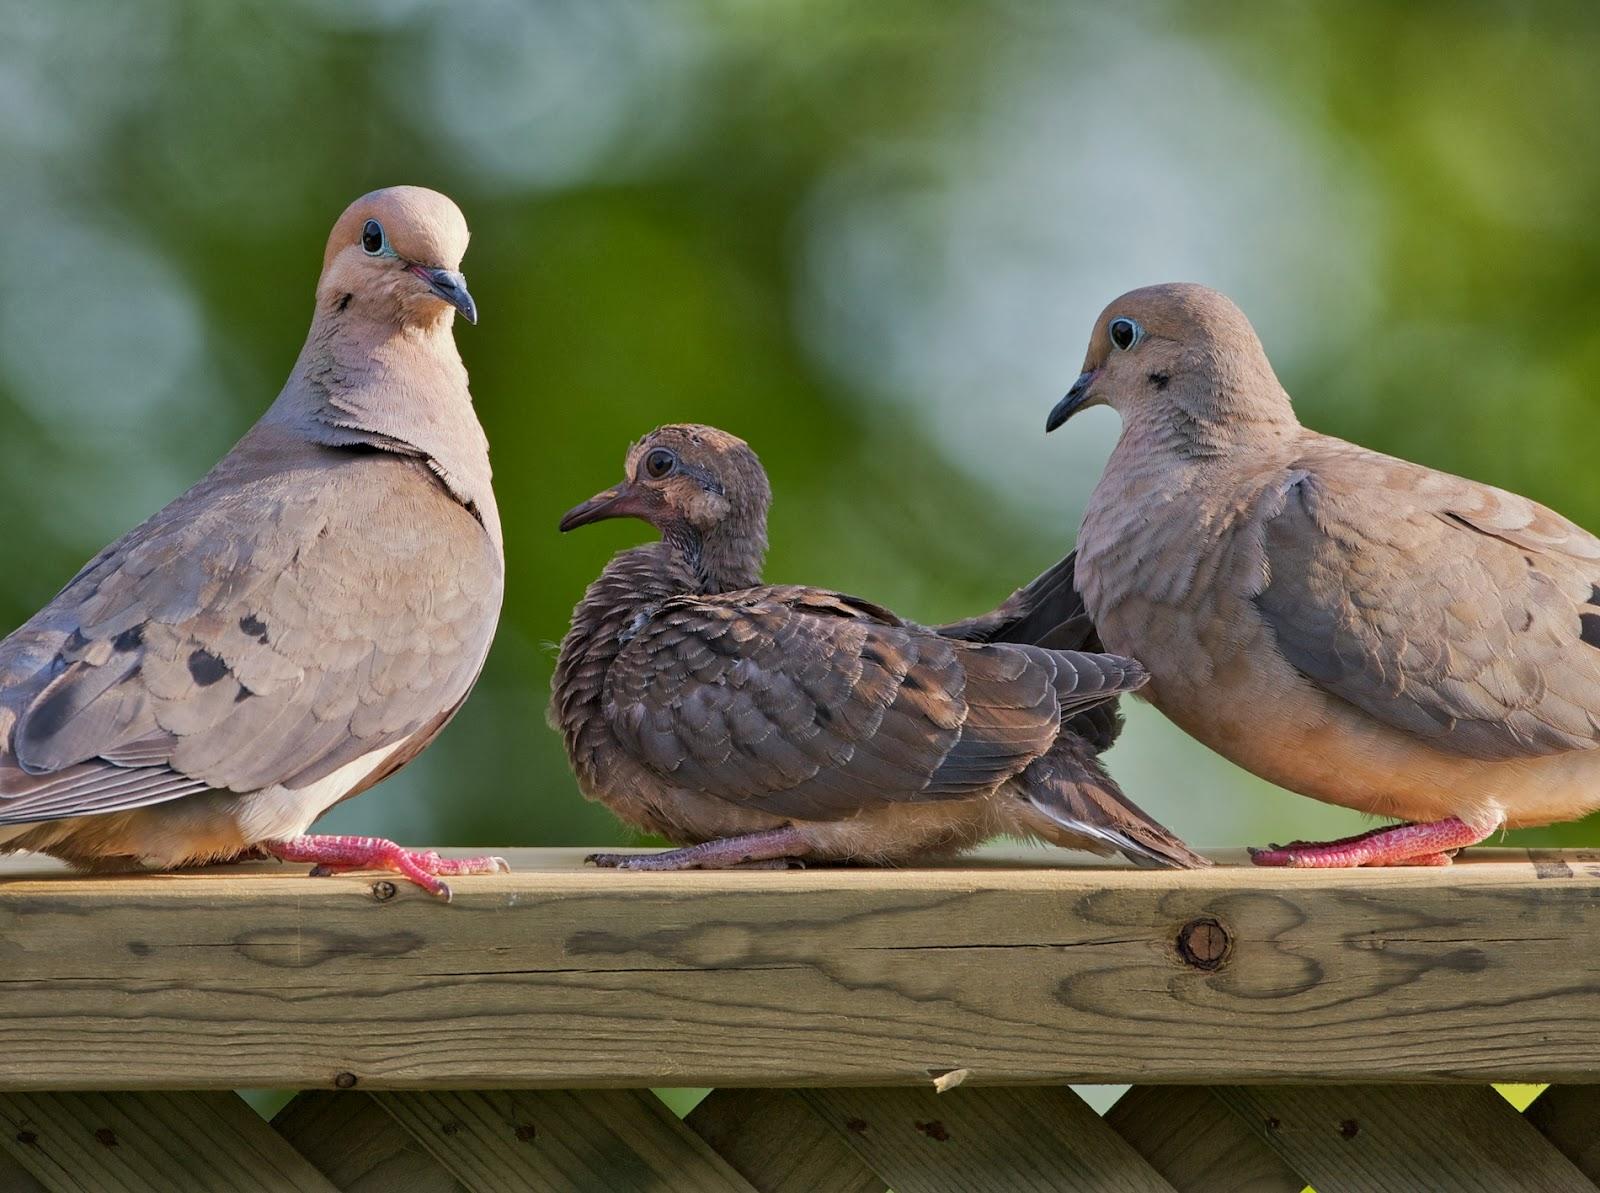 The animal alliance office to kill a dove carol l edwards photography buycottarizona